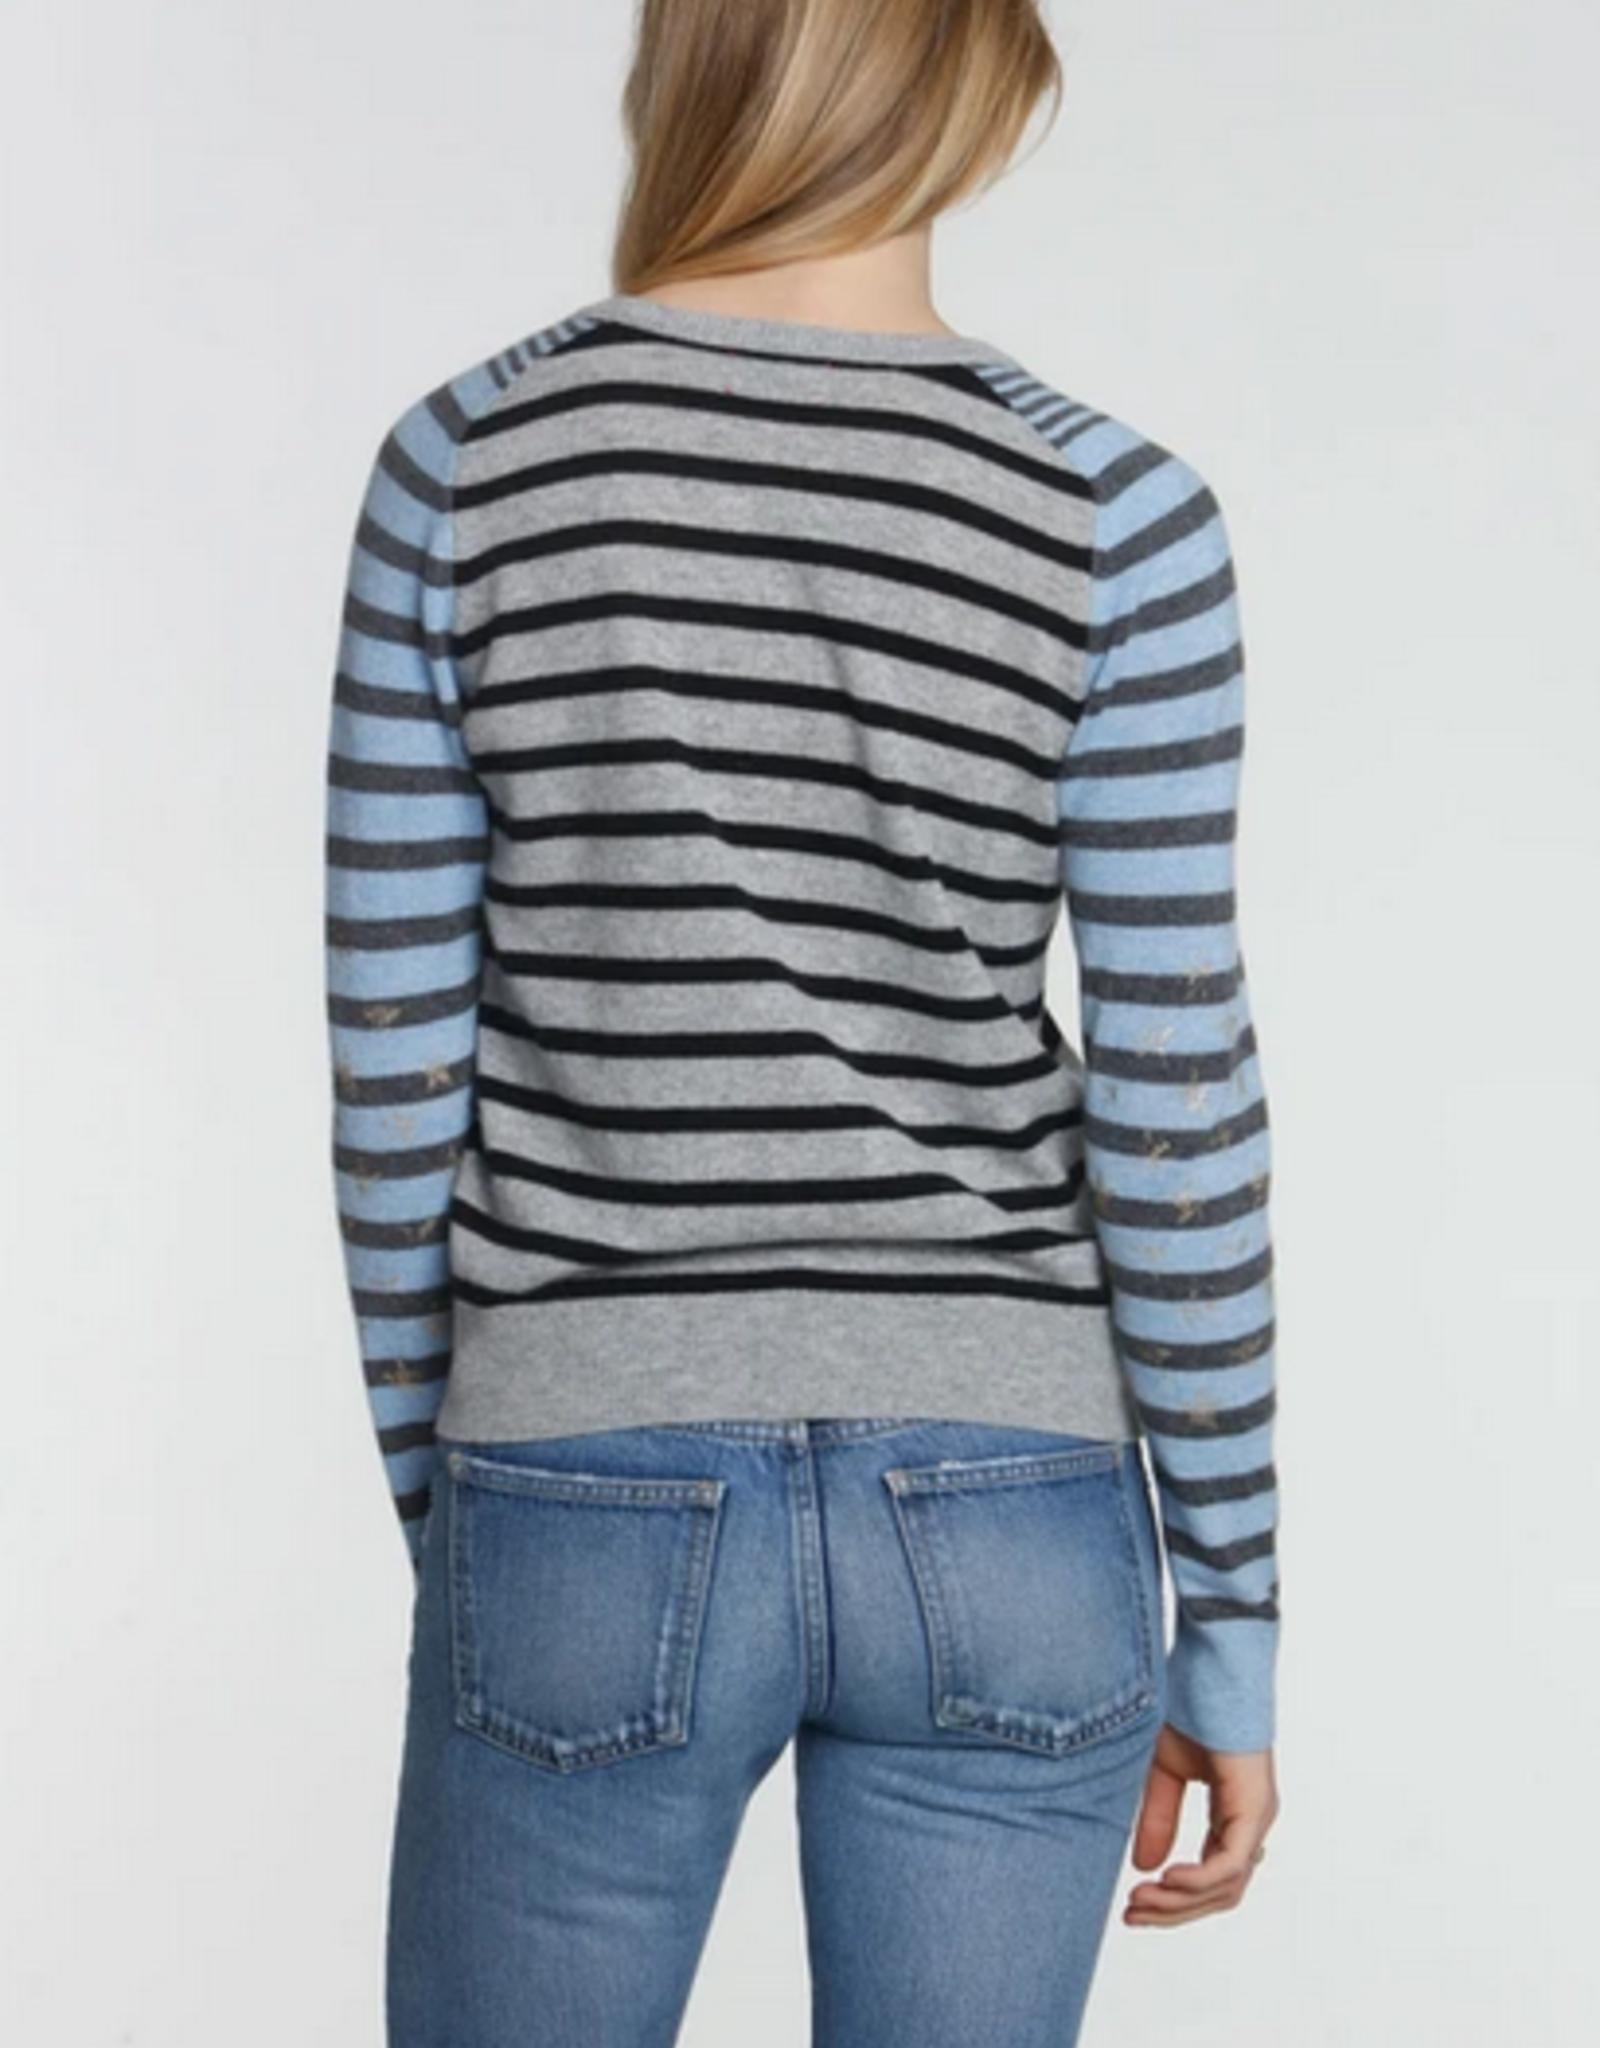 LABEL+thread Label + Thread Stars and Stripes Sweater